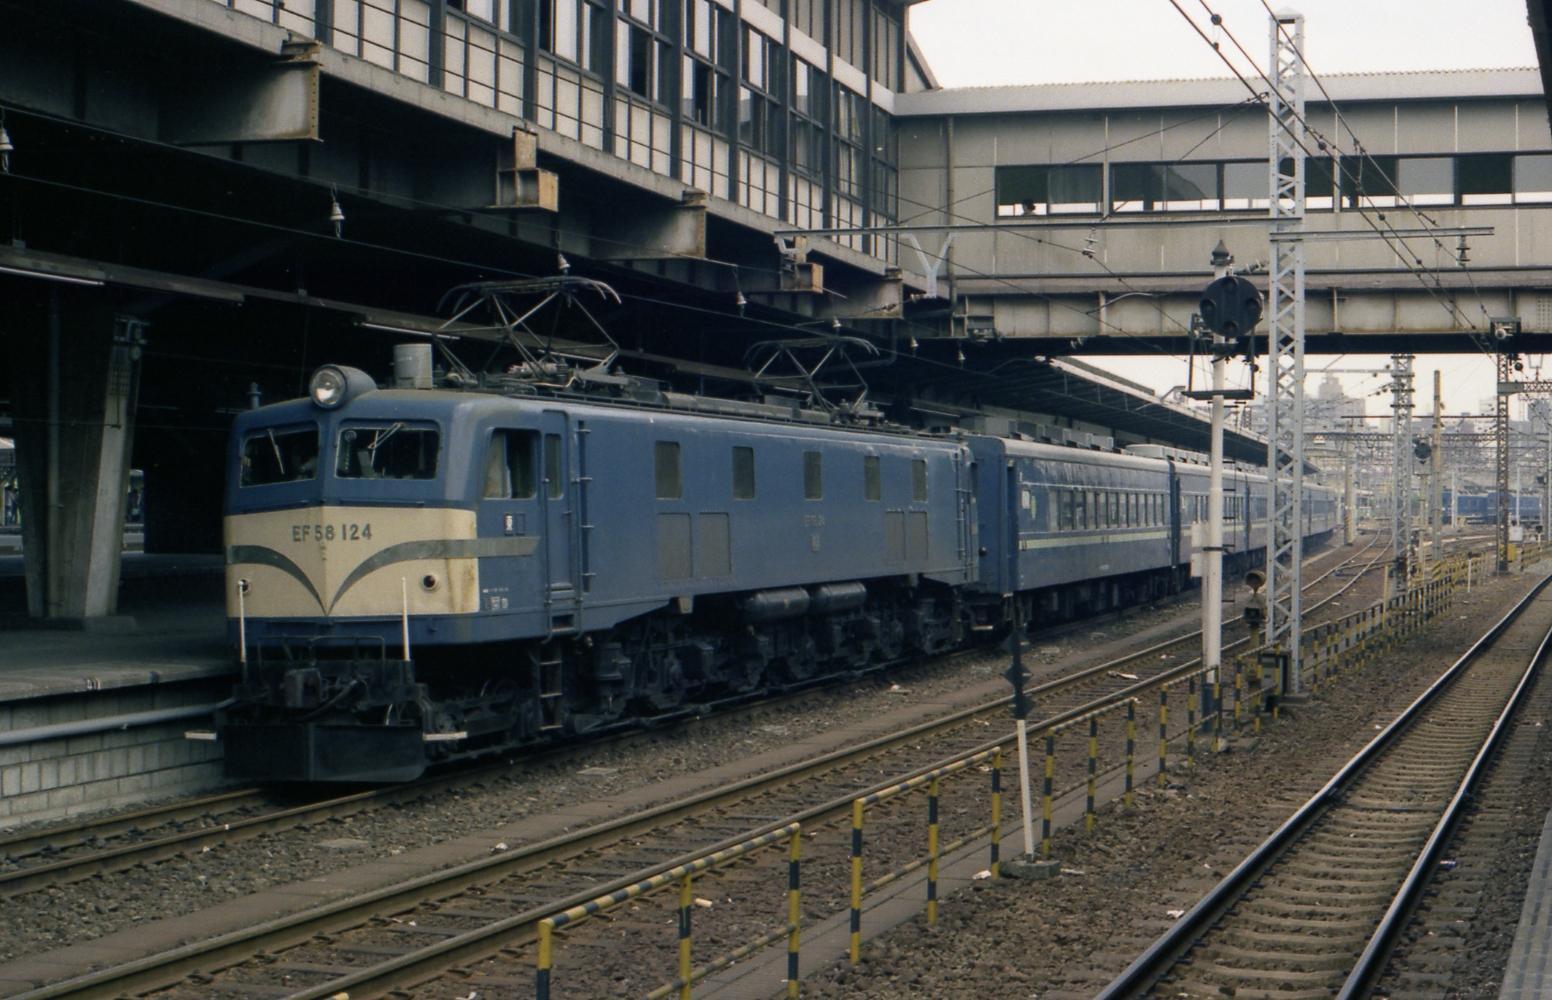 19790620a01